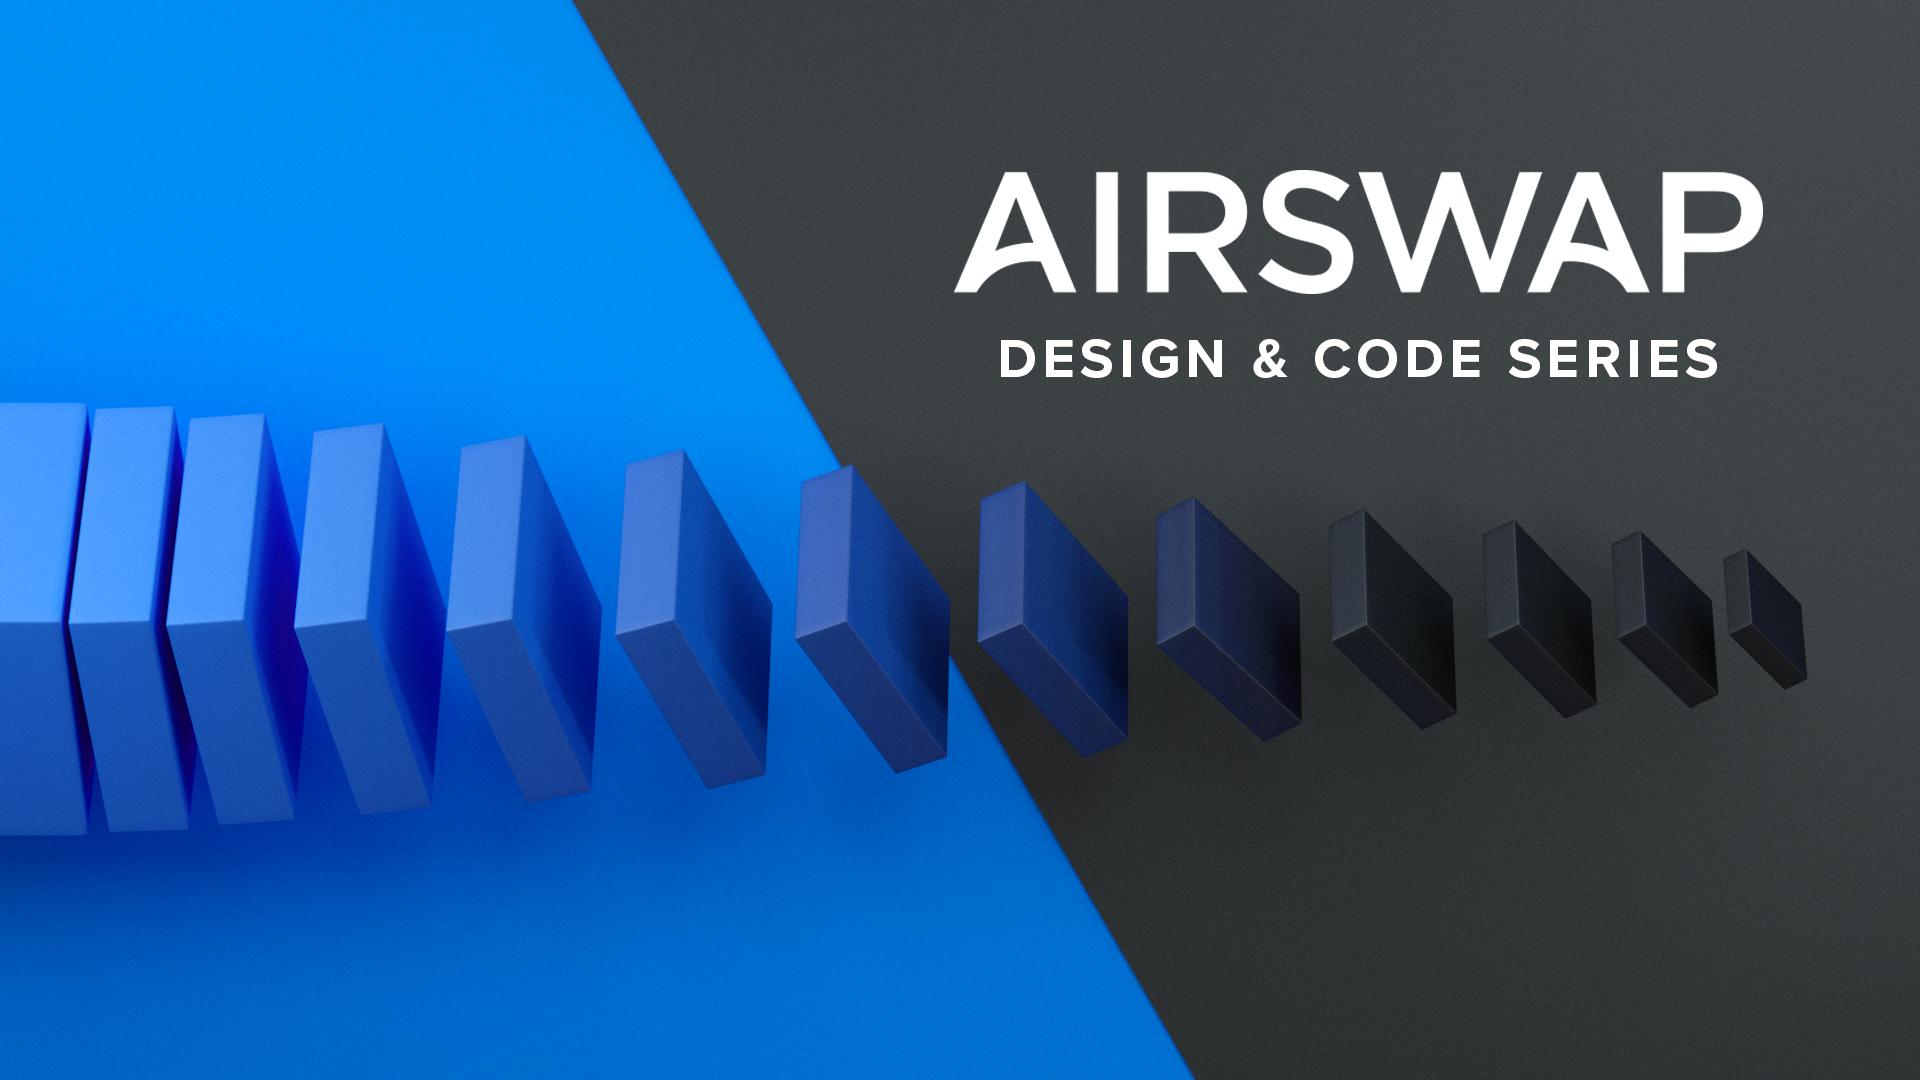 /bridging-the-gap-between-design-code-b6e330e16d93 feature image